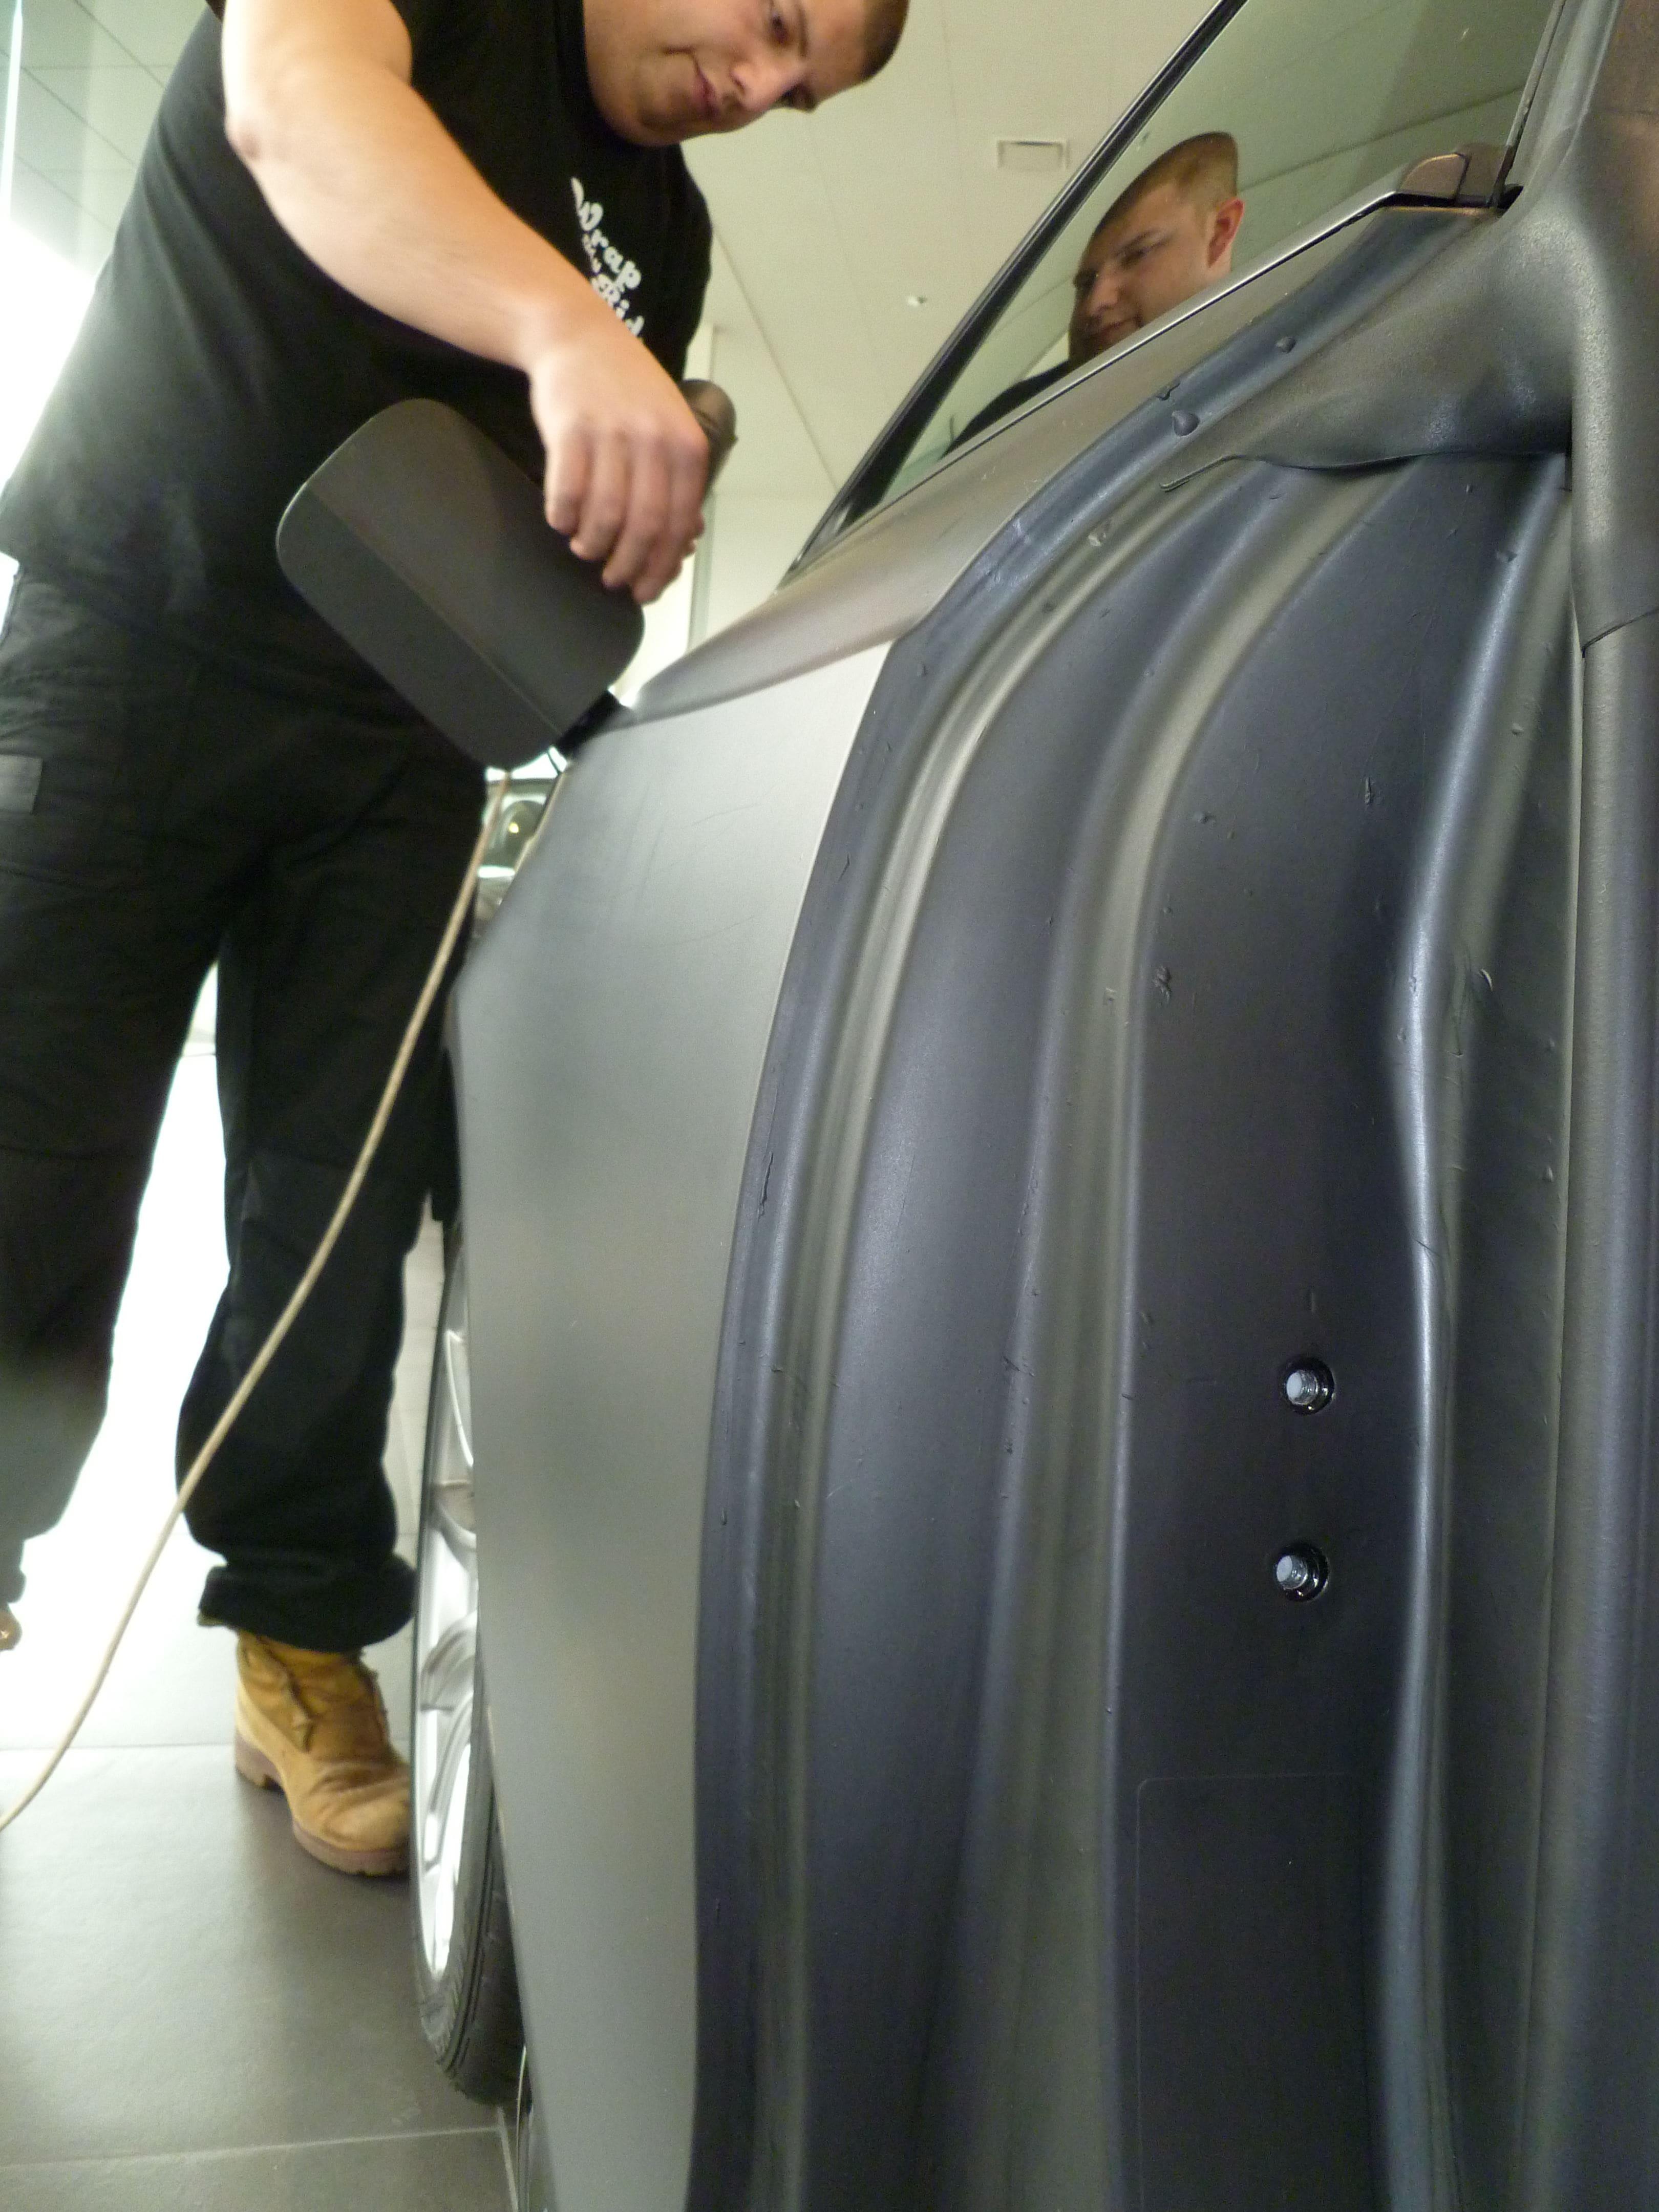 Audi A5 Coupe met Mat Zwarte Wrap, Carwrapping door Wrapmyride.nu Foto-nr:4621, ©2021